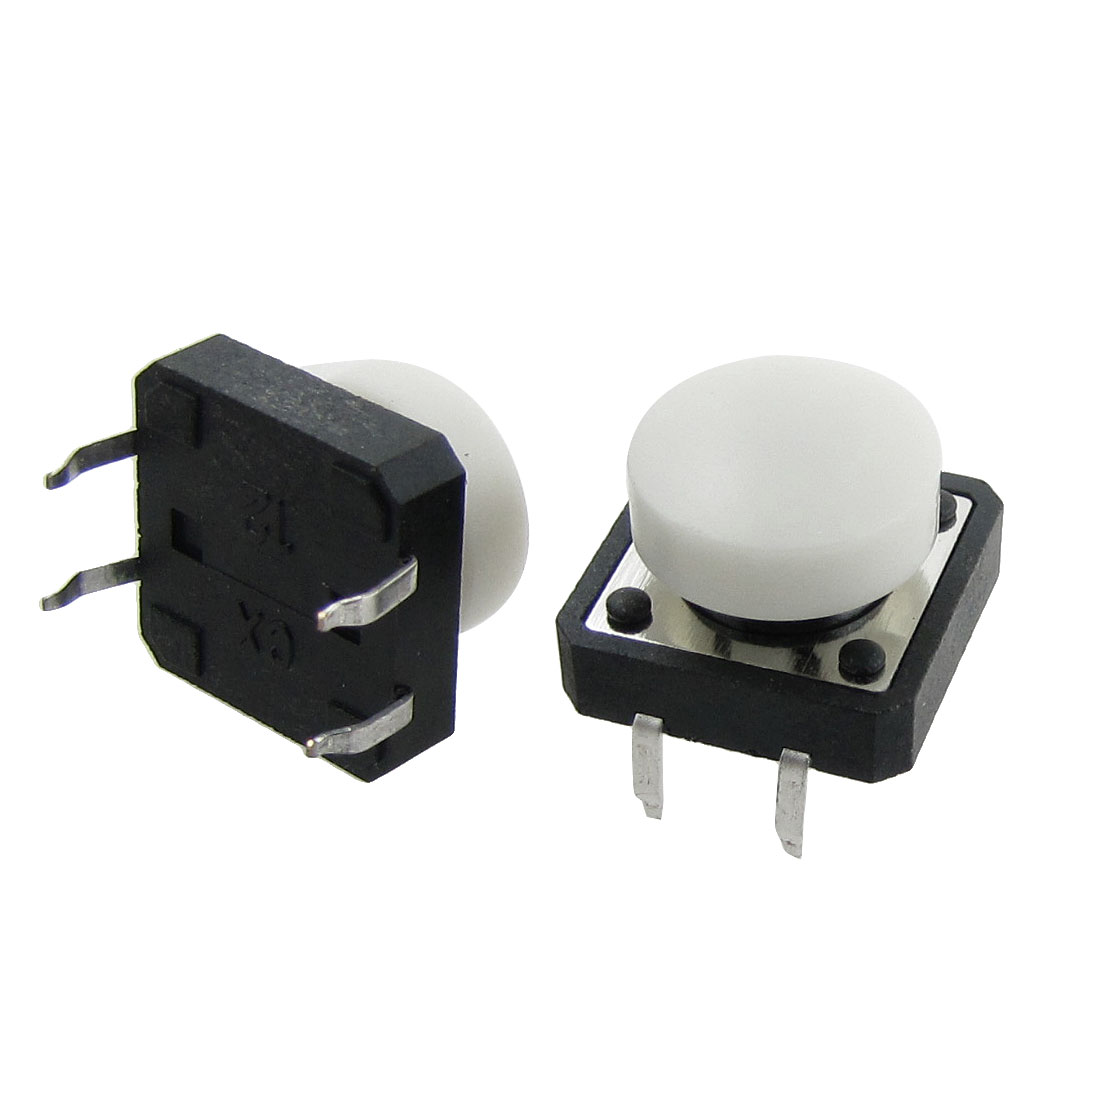 10 Pcs Momentary Tact Tactile Push Button Switch 12 x 12 x 12mm 4 Pin DIP w Cap